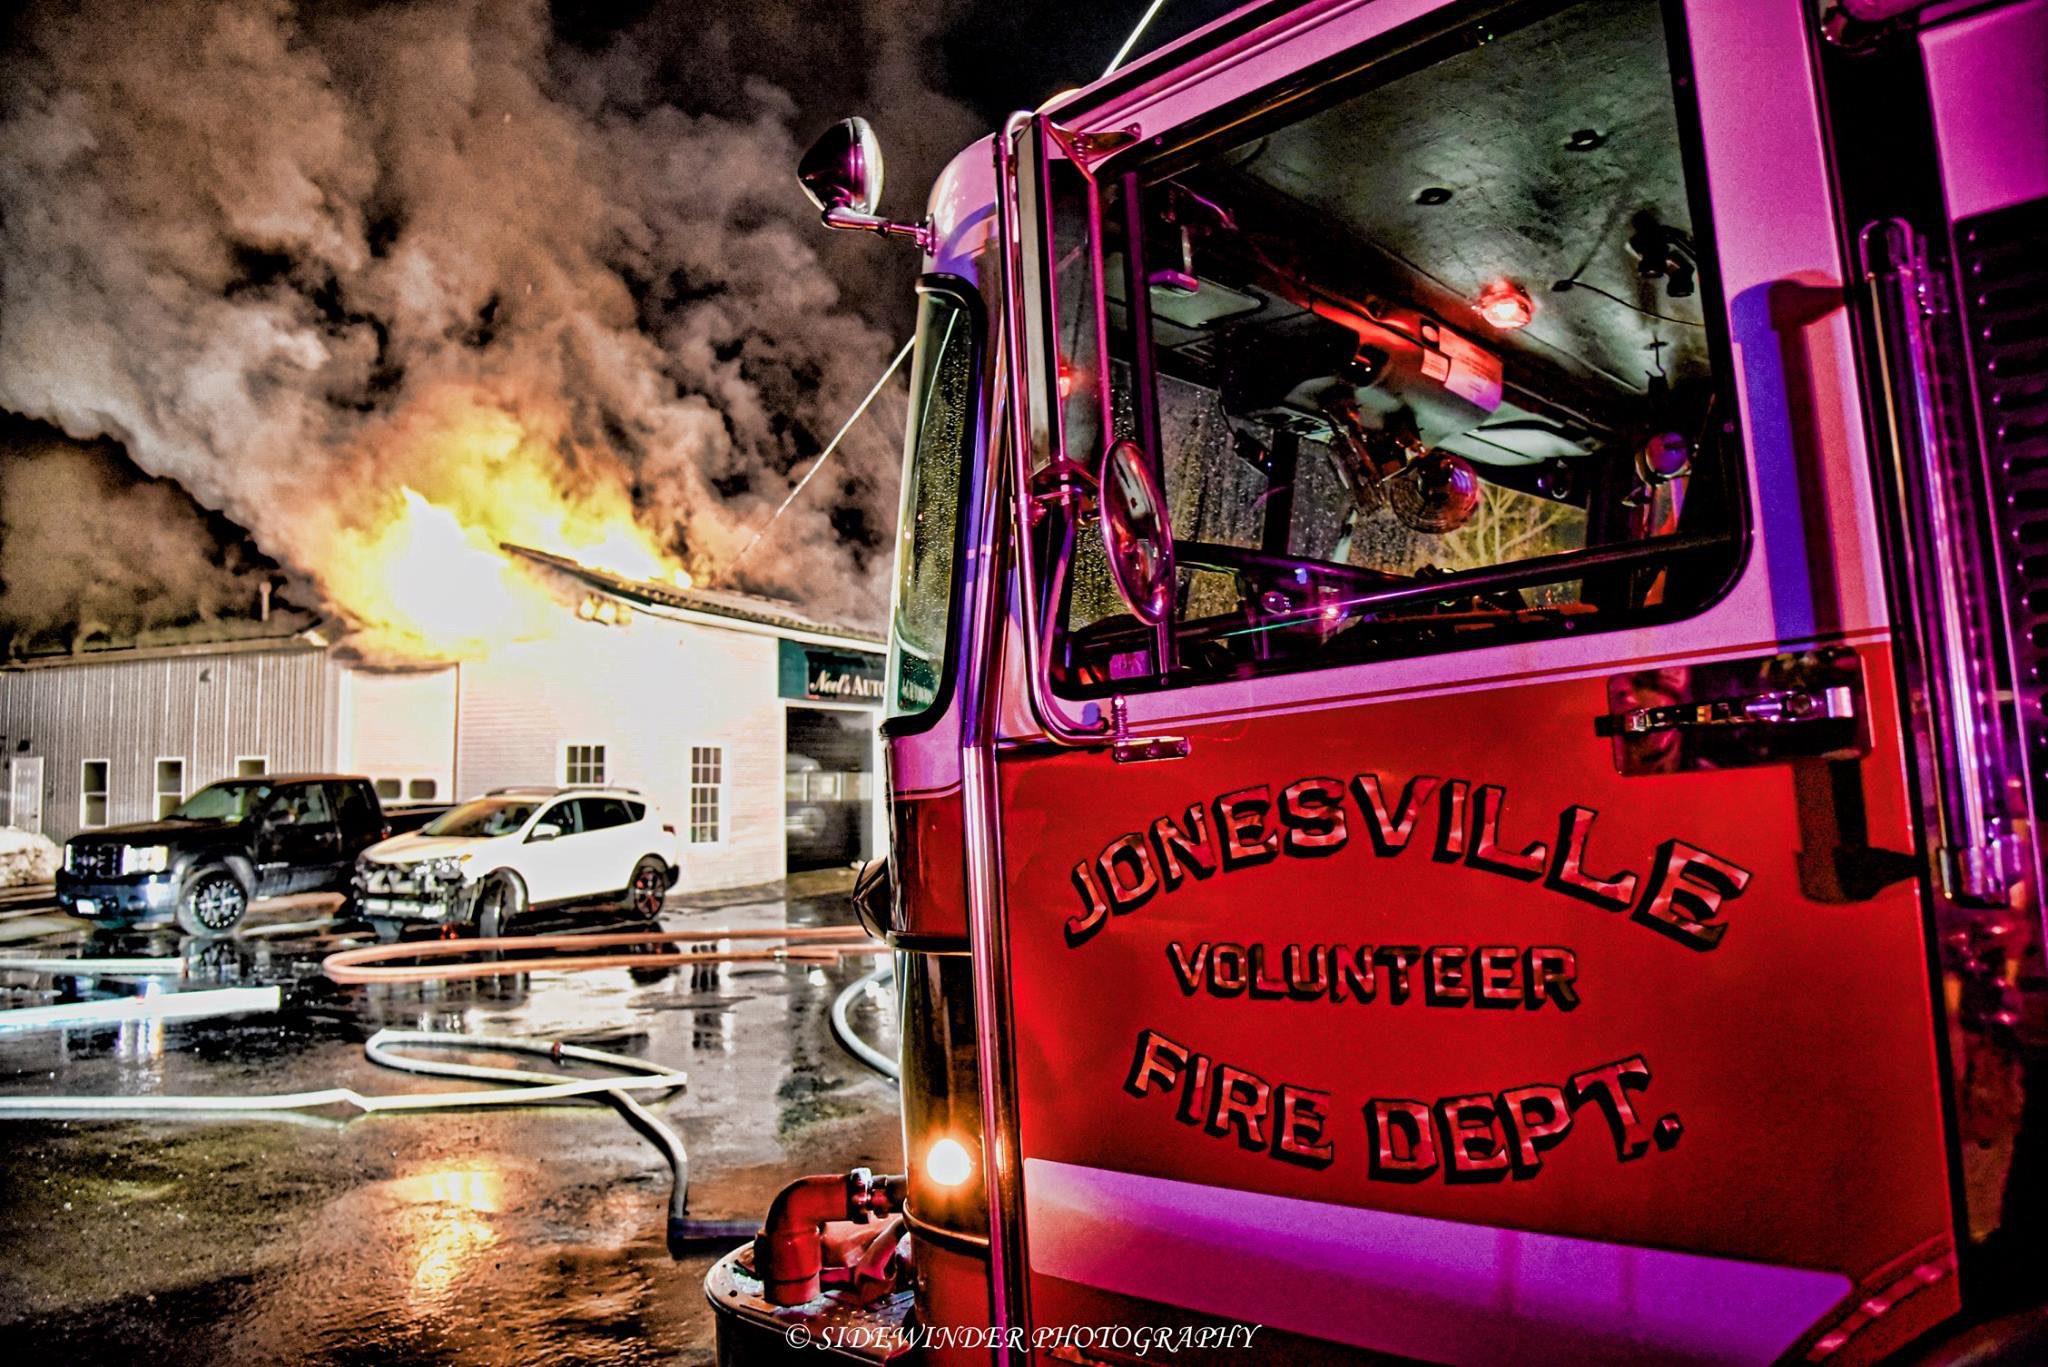 Structure Fire Photos